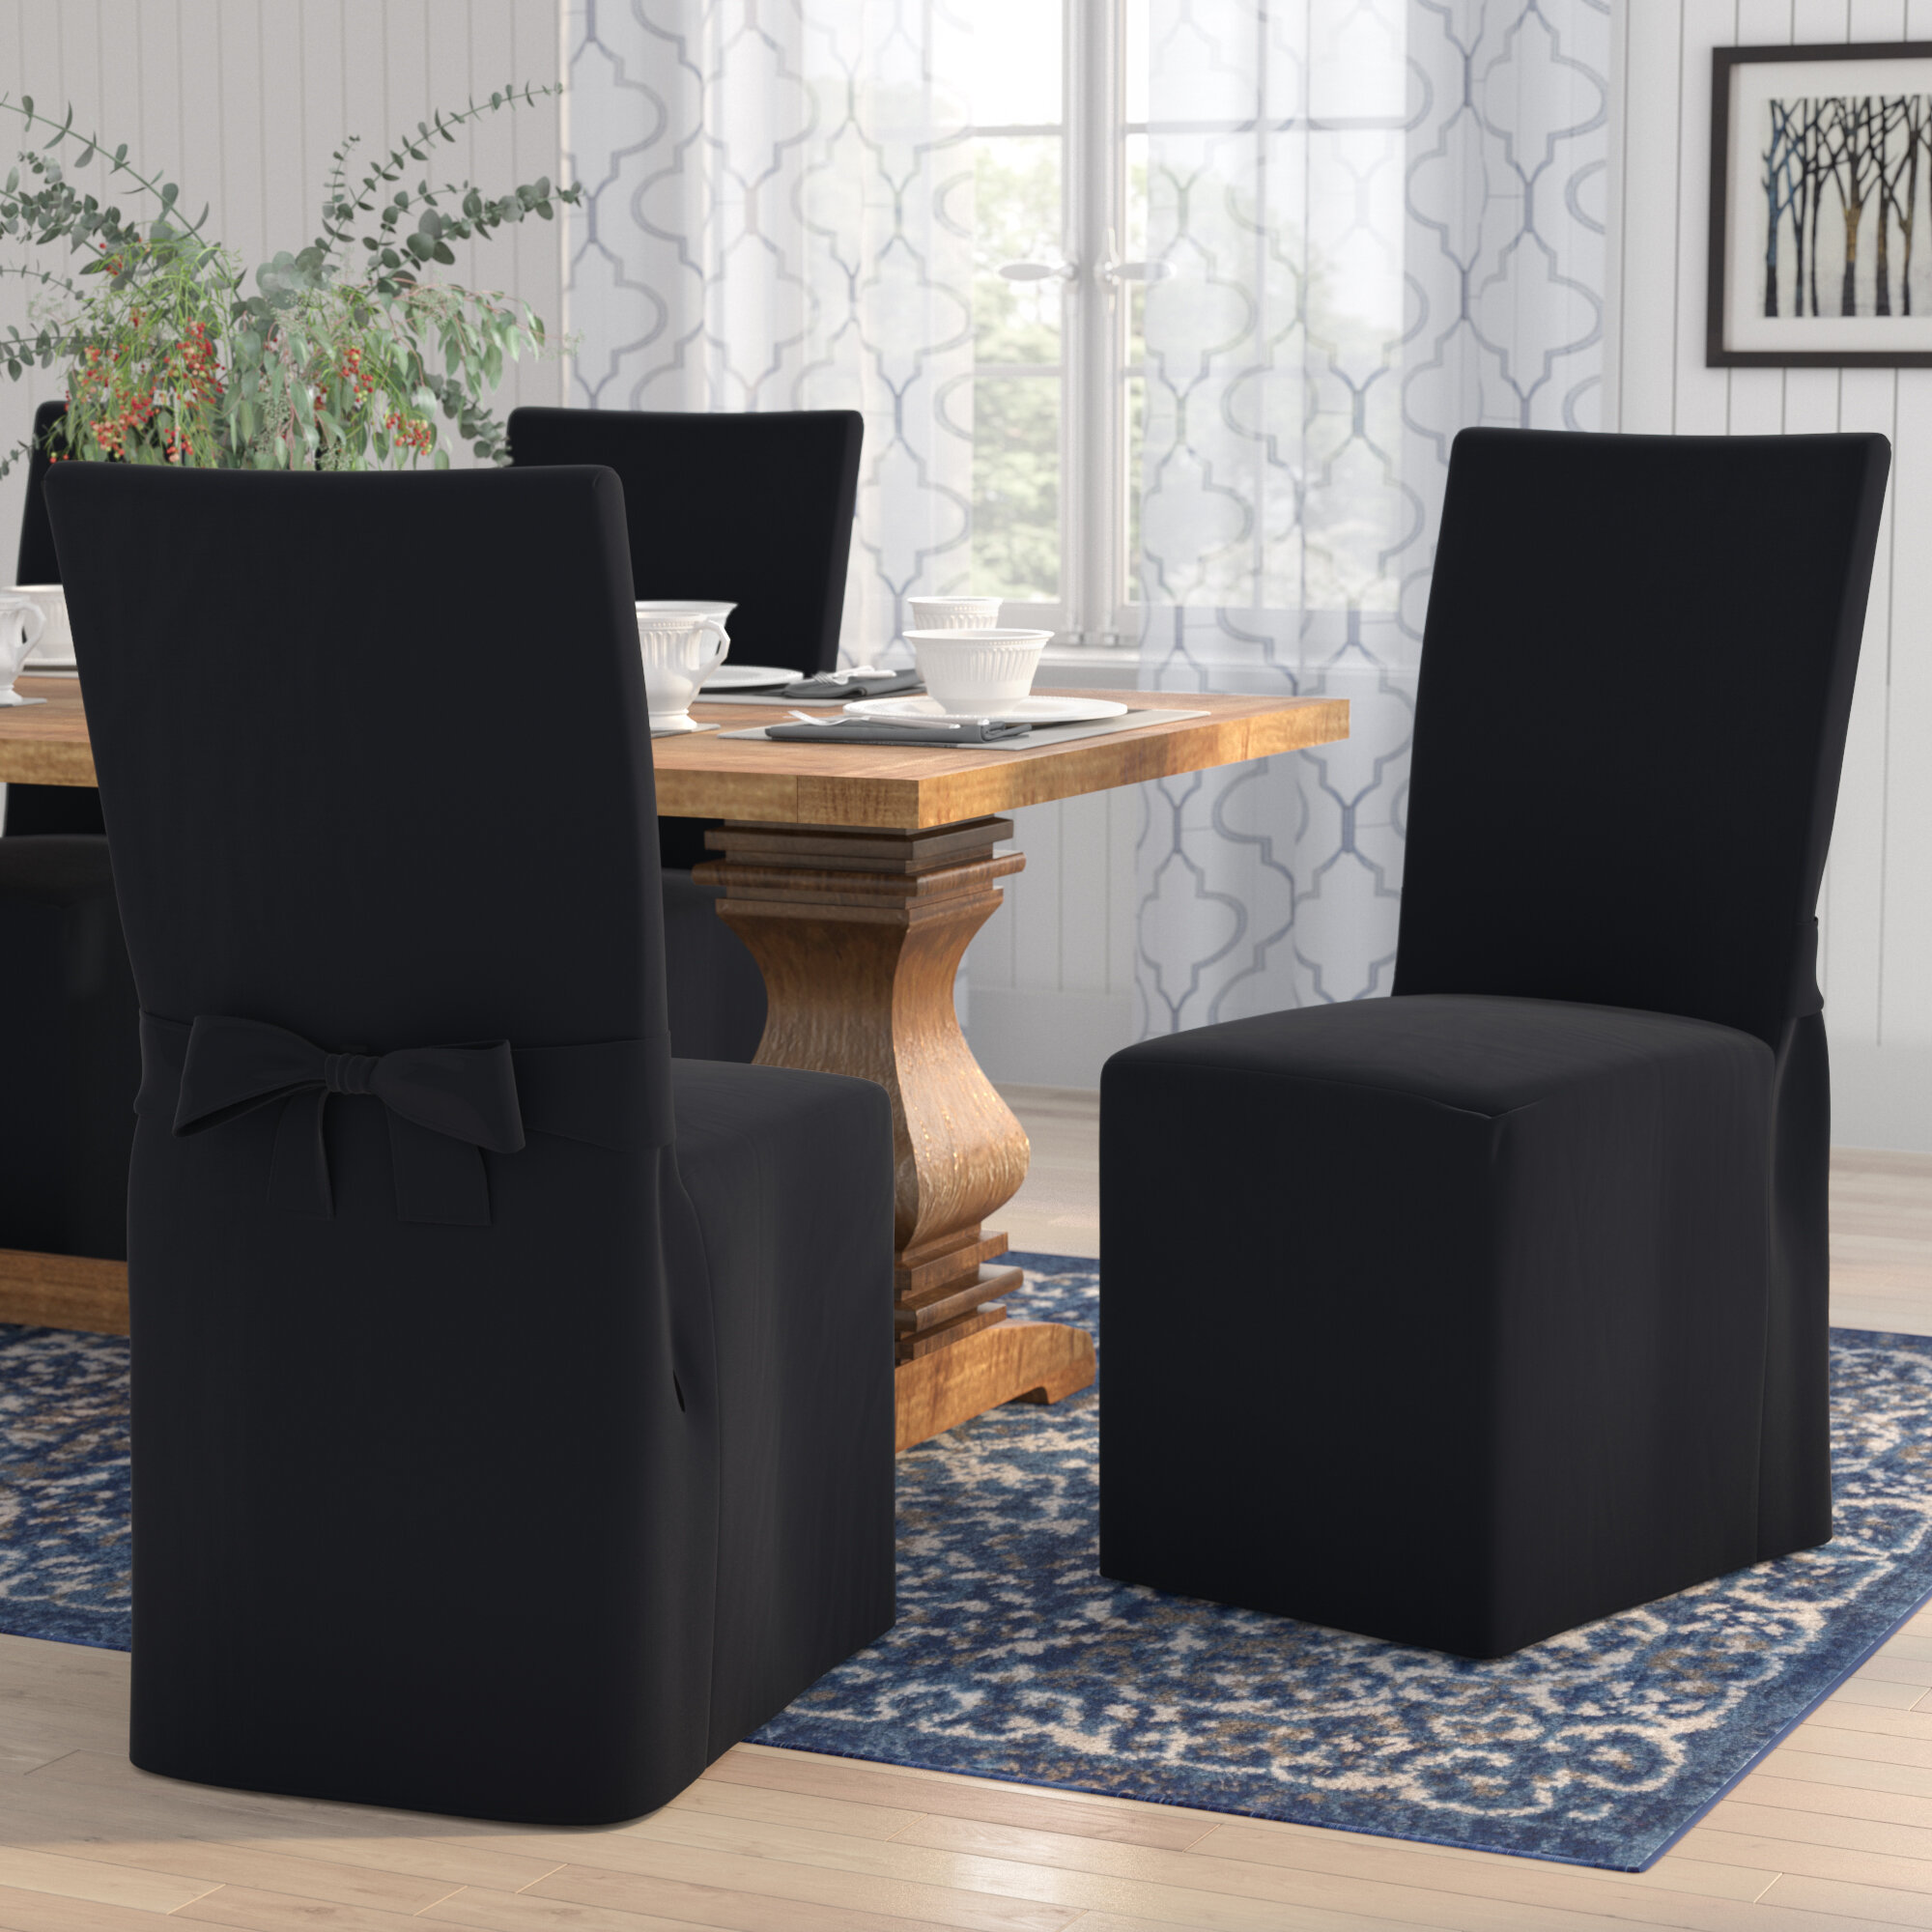 Charlton Home Box Cushion Dining Chair Slipcover Reviews Wayfair